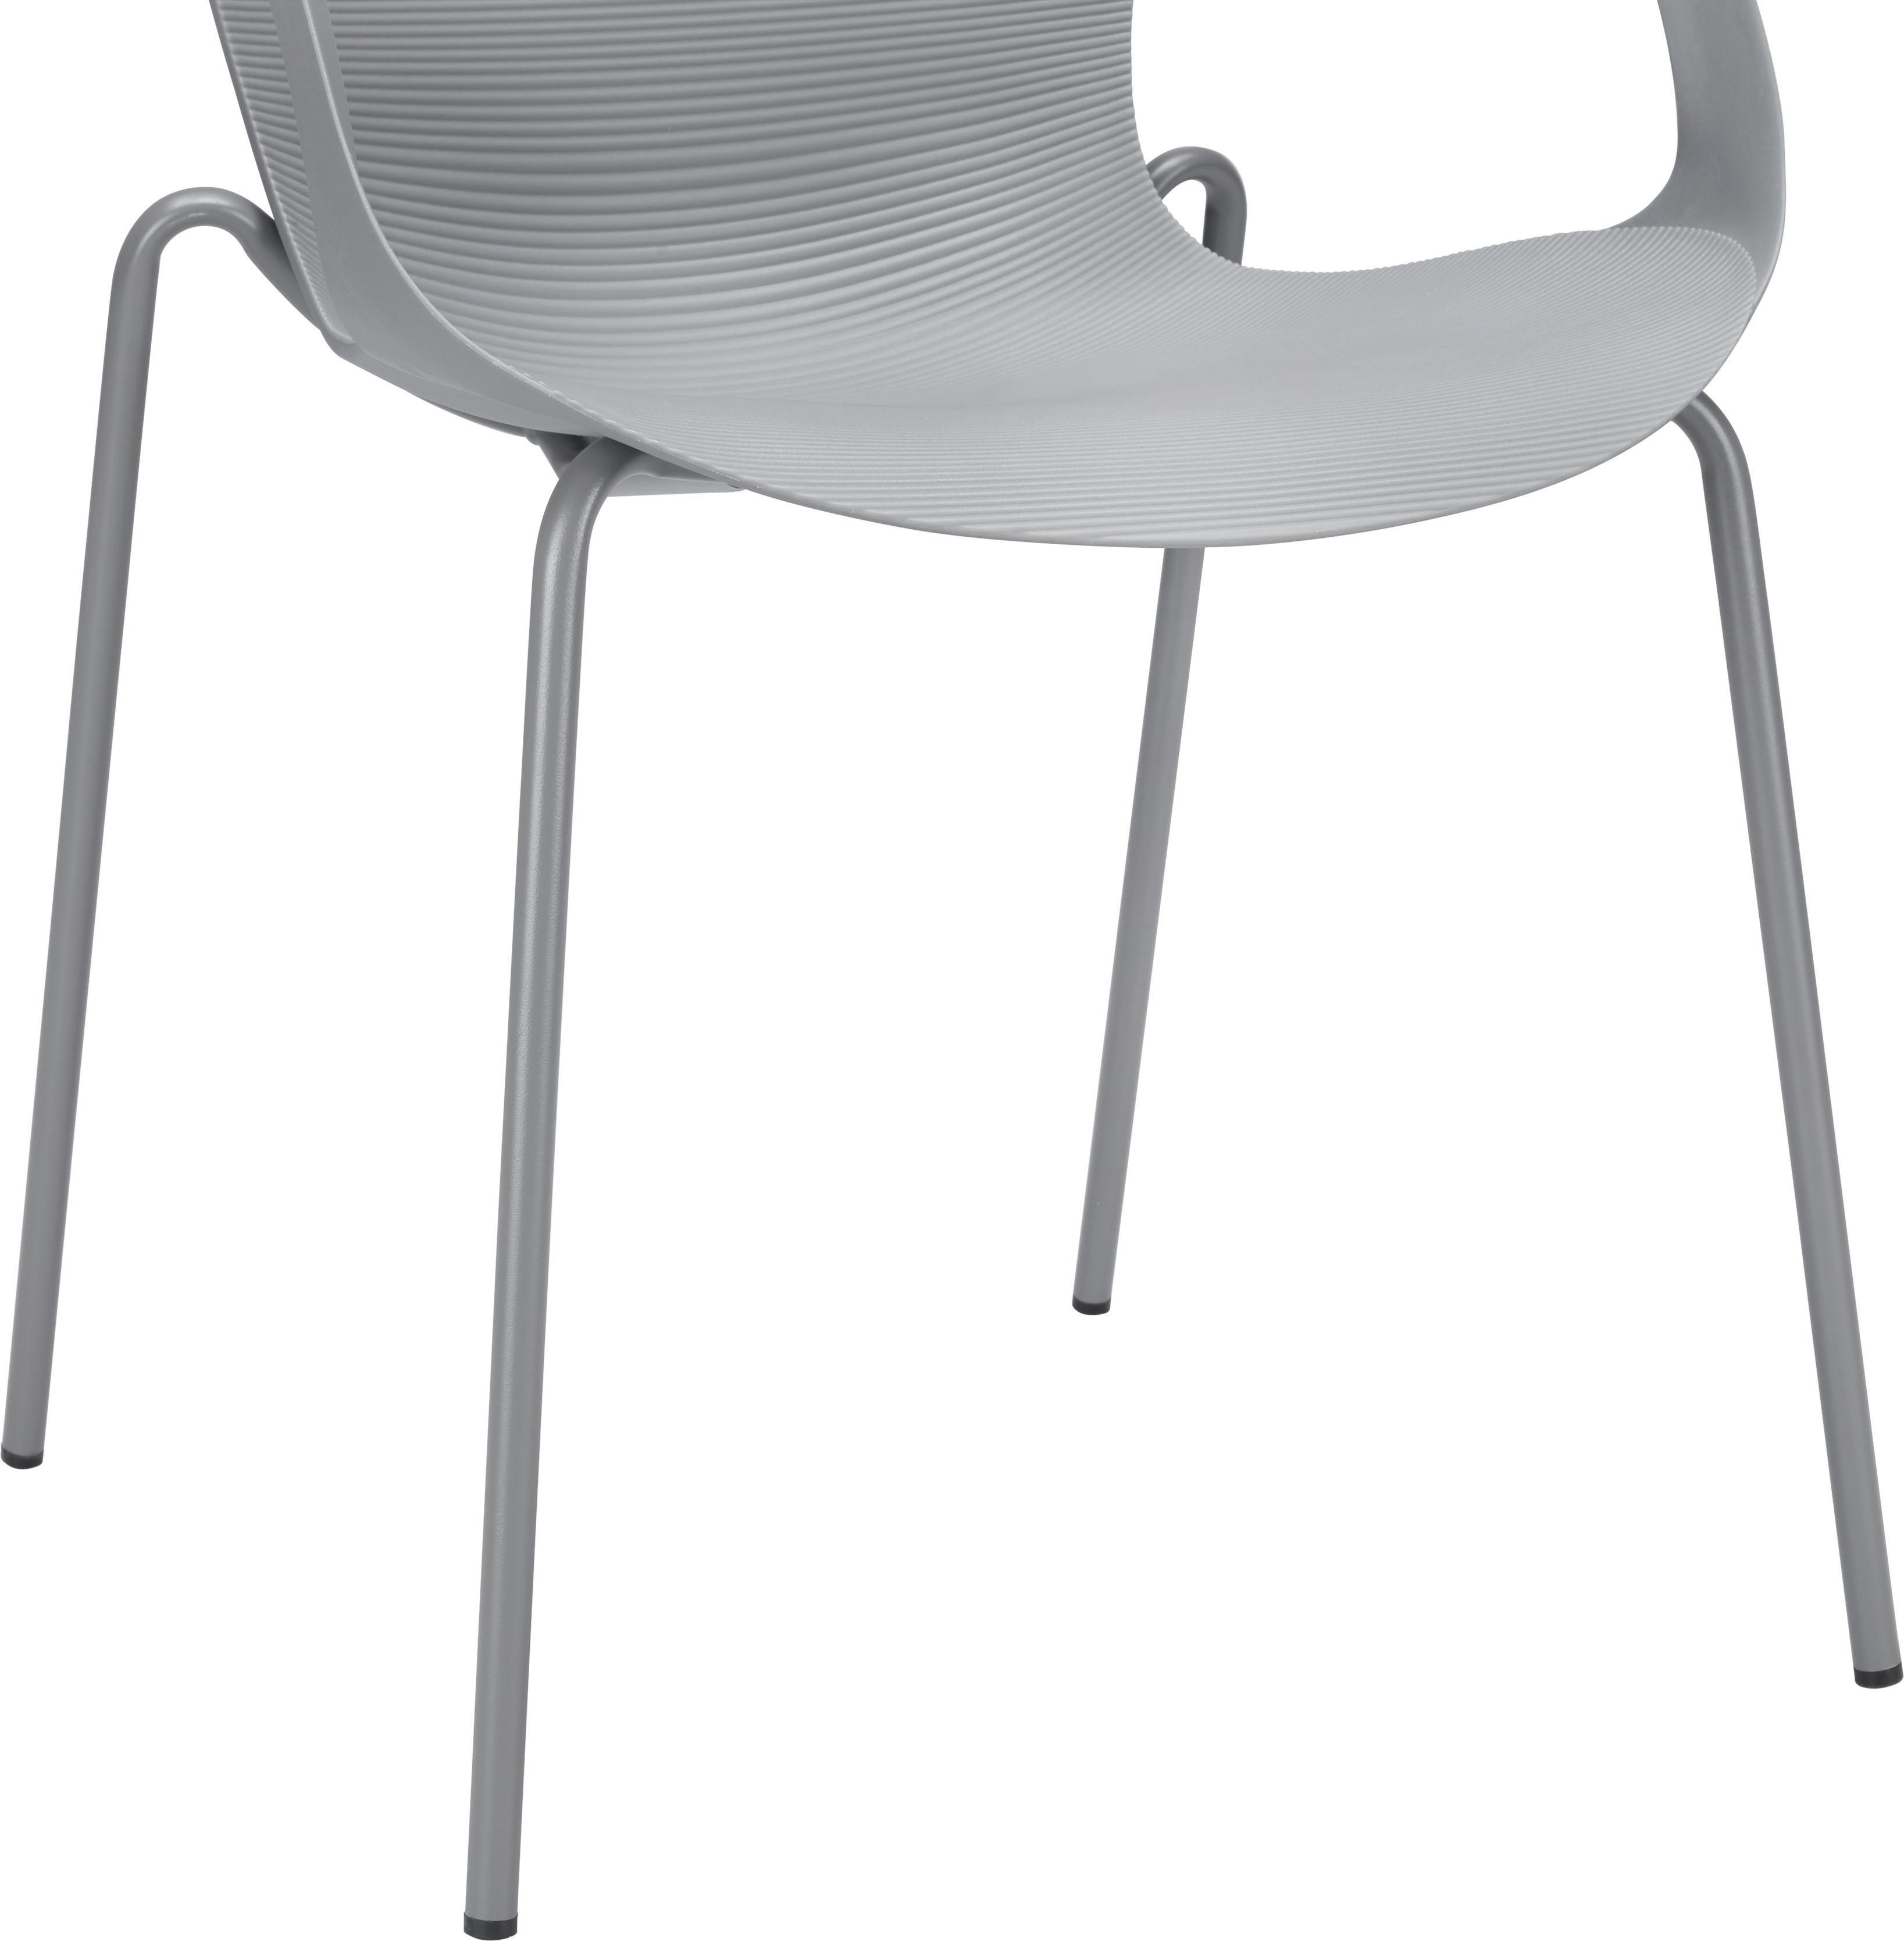 Gartenstuhl Garcia - Grau, MODERN, Kunststoff/Metall (56/75/54cm) - MODERN LIVING